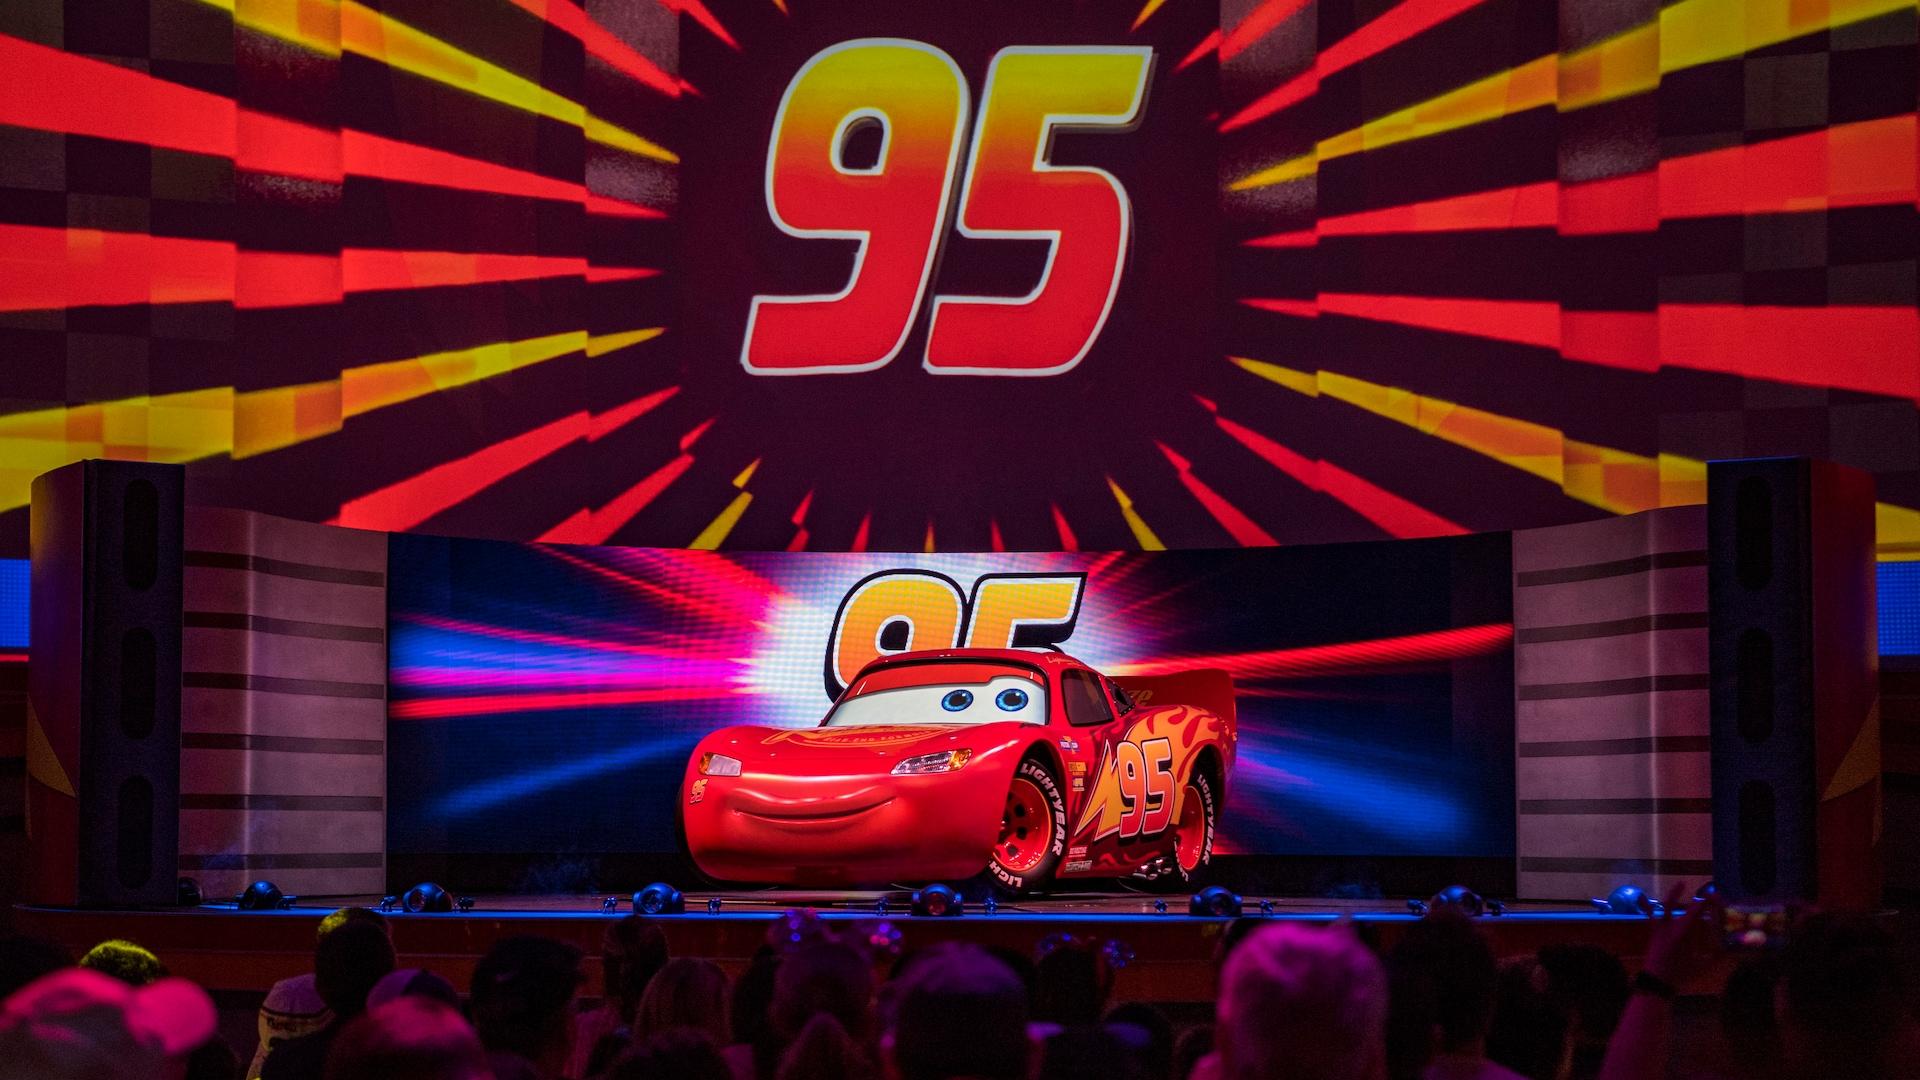 Lightning Mcqueen S Racing Academy At Disney S Hollywood Studios Walt Disney World Resort